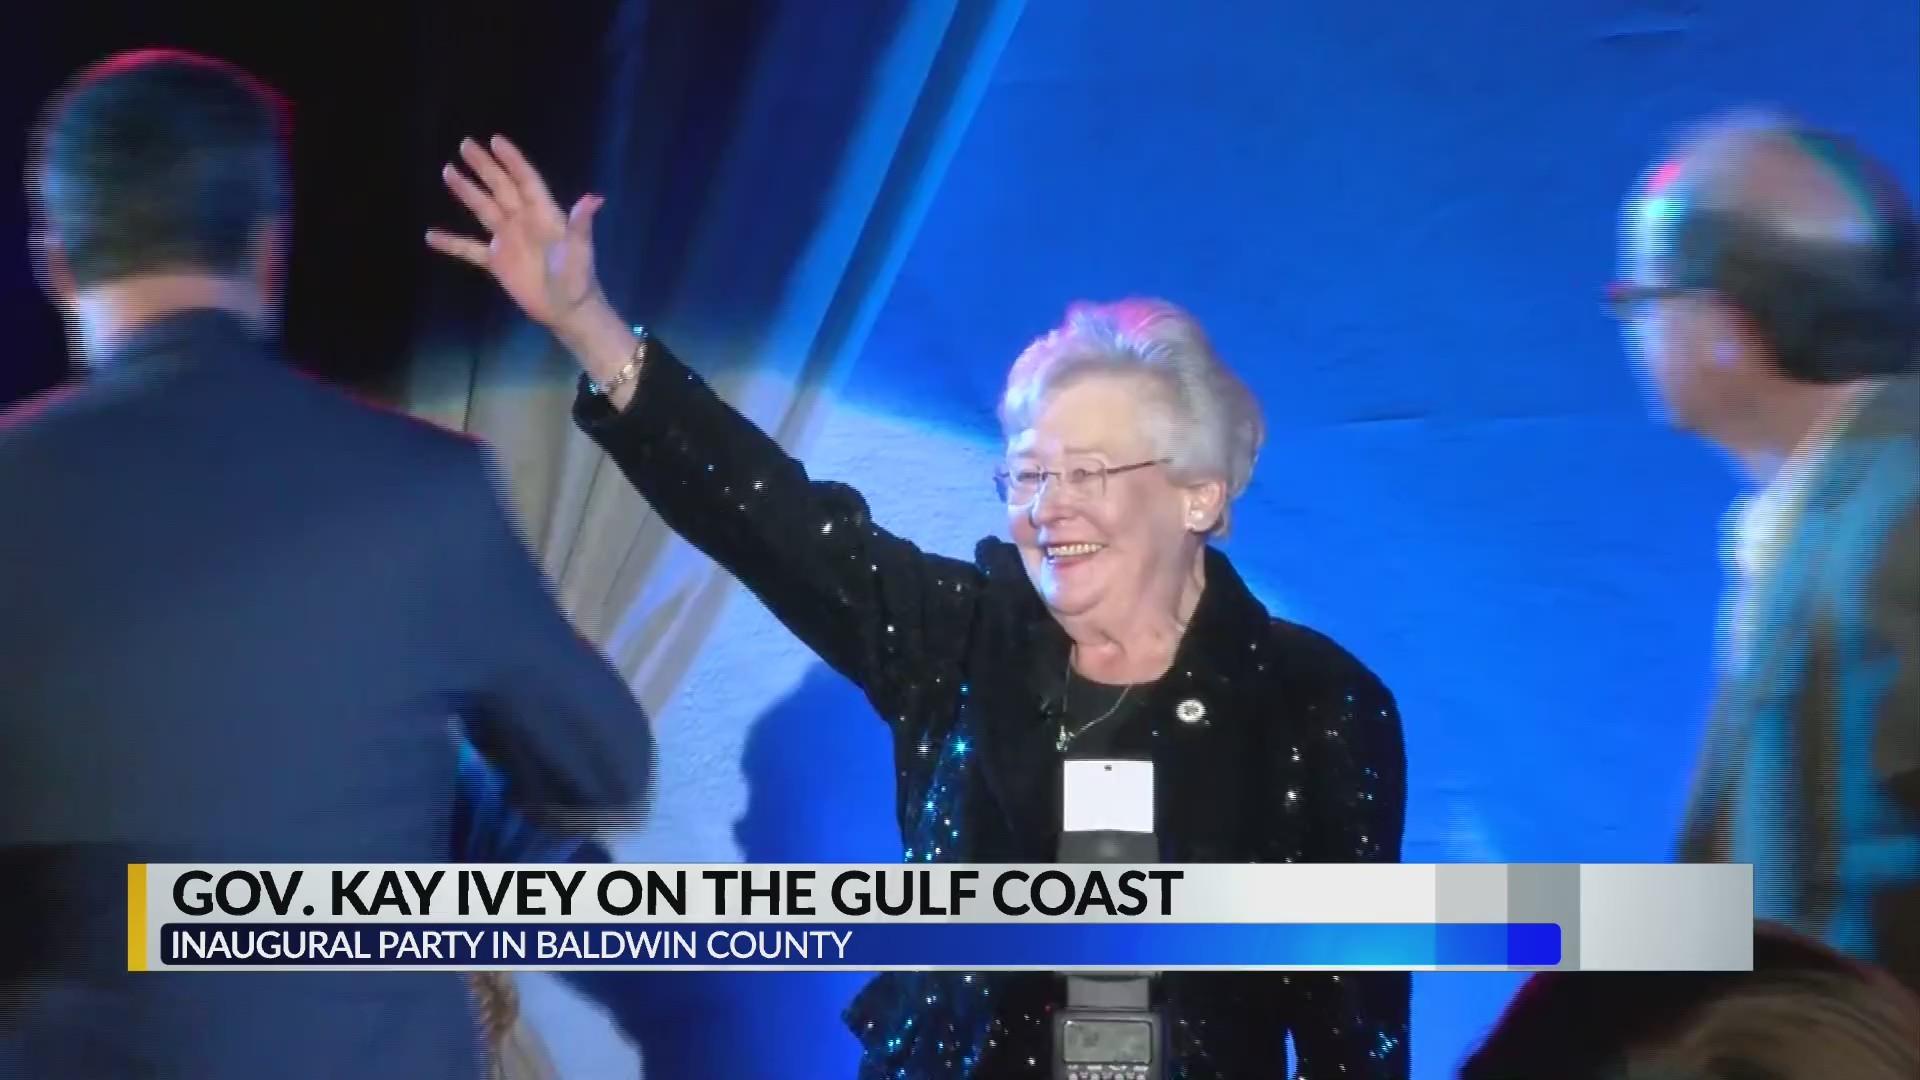 Governor Kay Ivey kicks off inauguration celebrations on Gulf Coast.